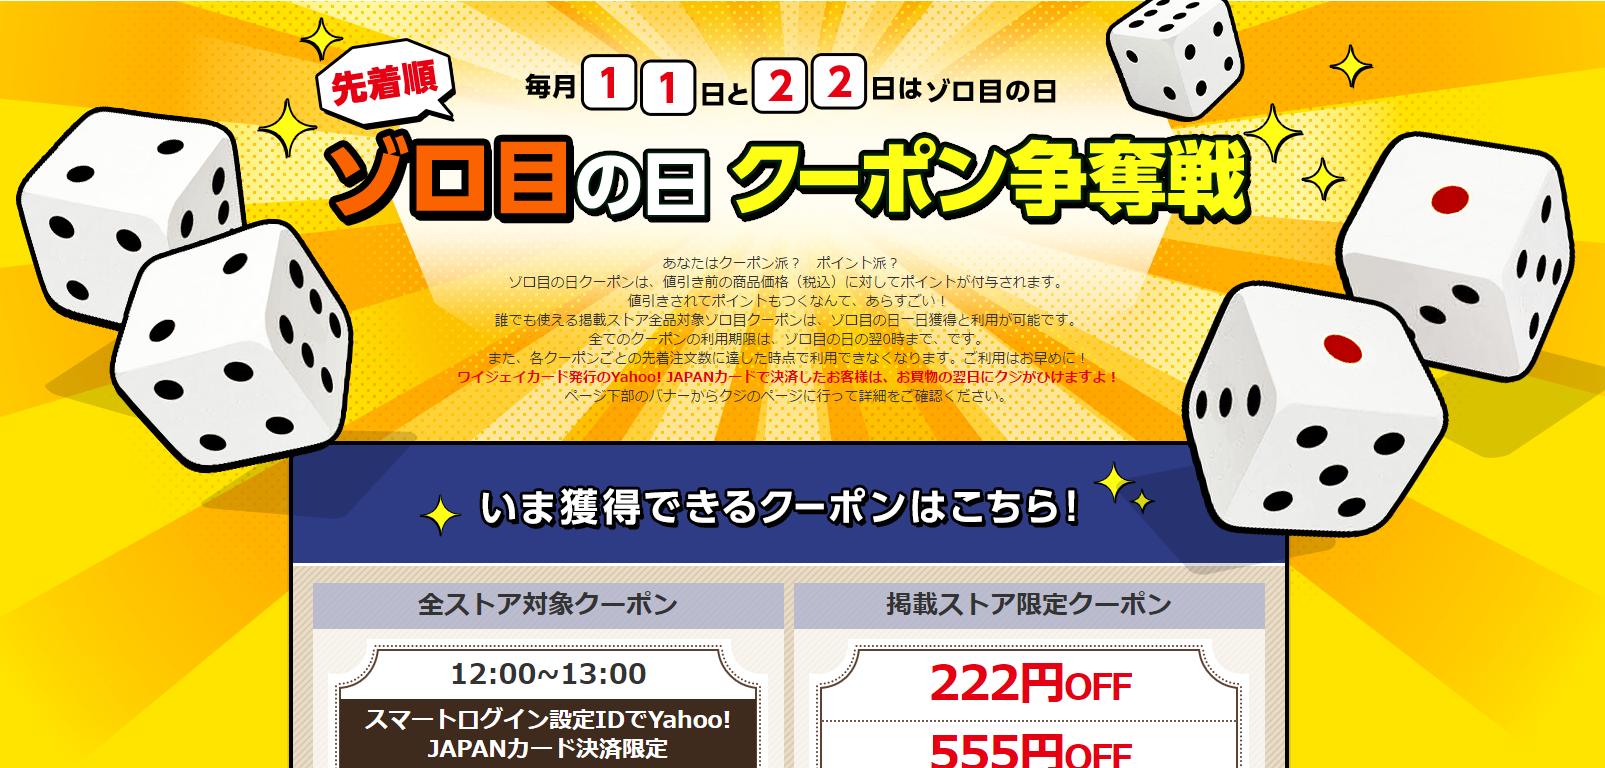 Yahooショッピング先着順ゾロ目の日クーポン争奪戦